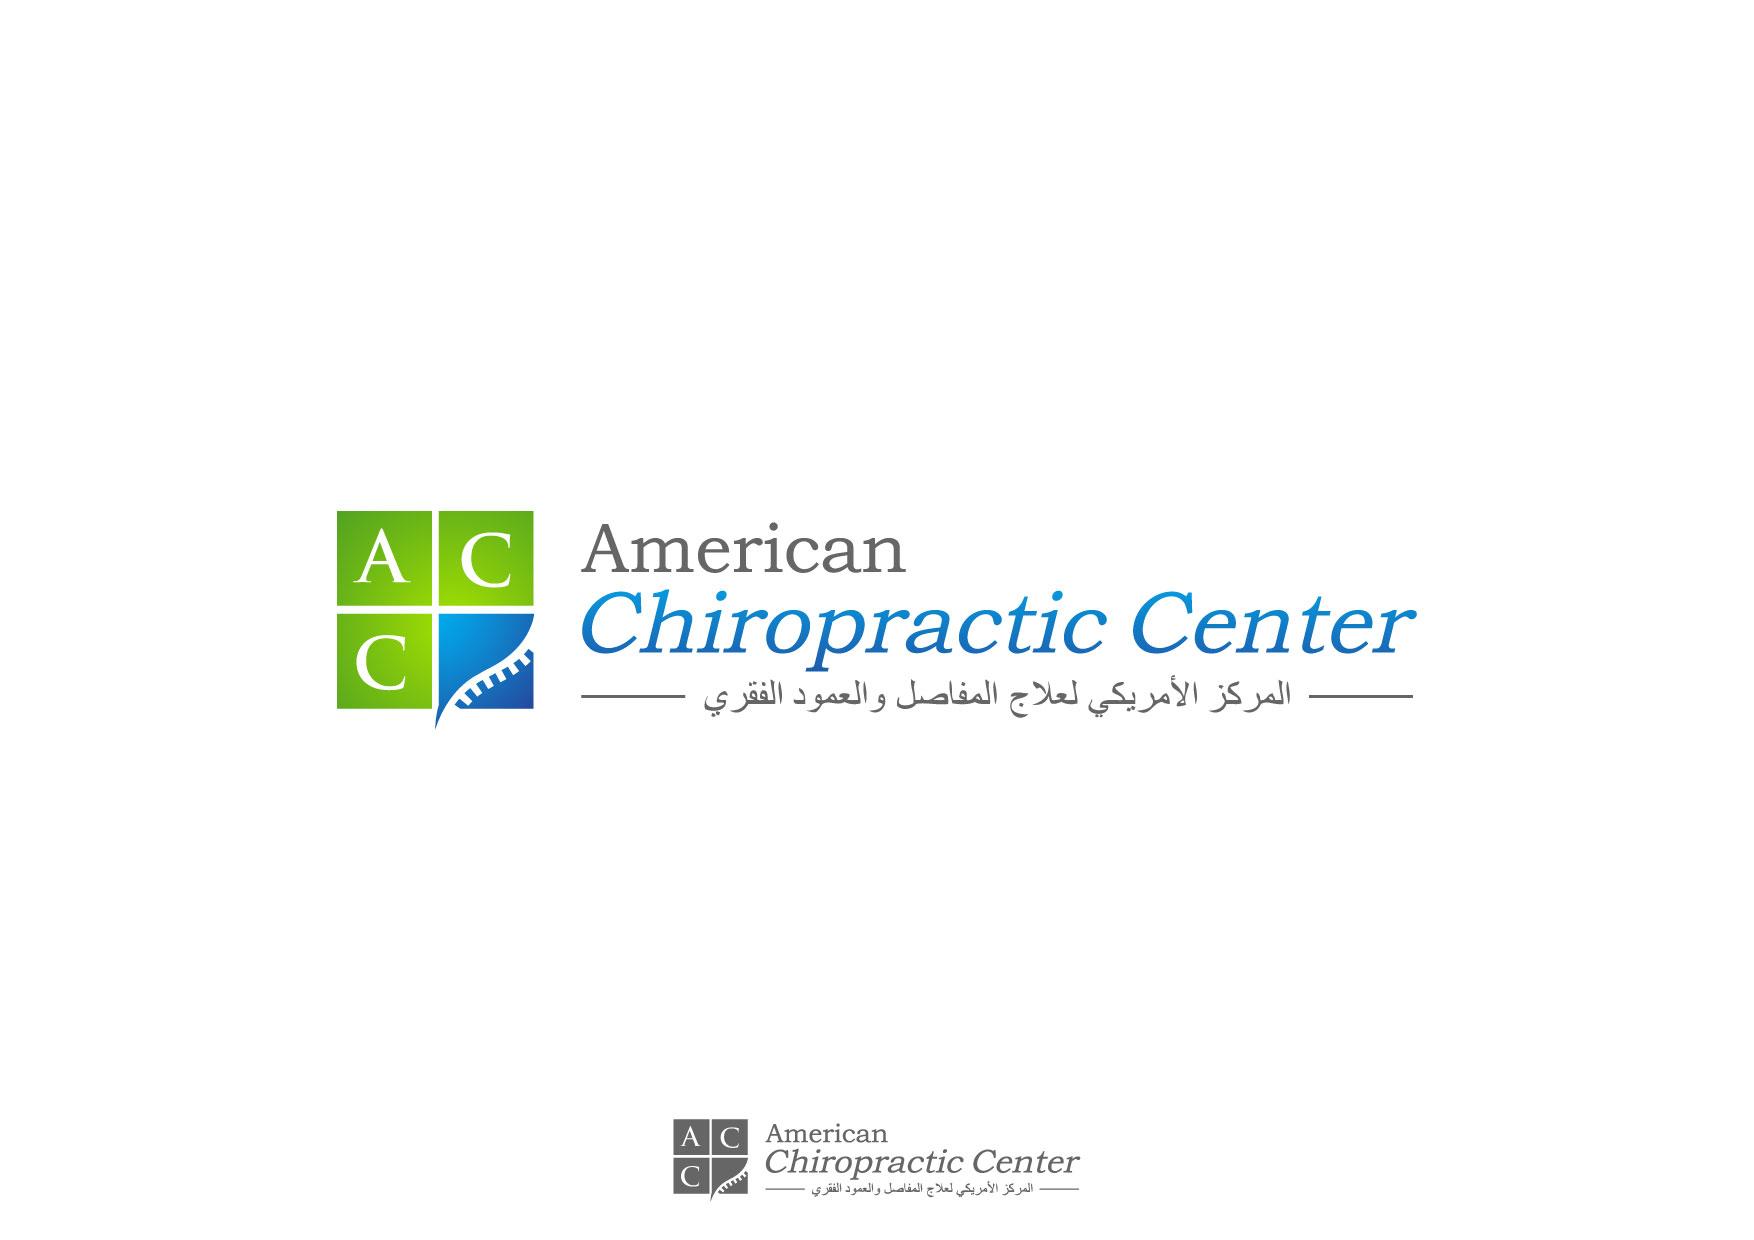 Logo Design by Nurgalih Destianto - Entry No. 101 in the Logo Design Contest Logo Design for American Chiropractic Center.